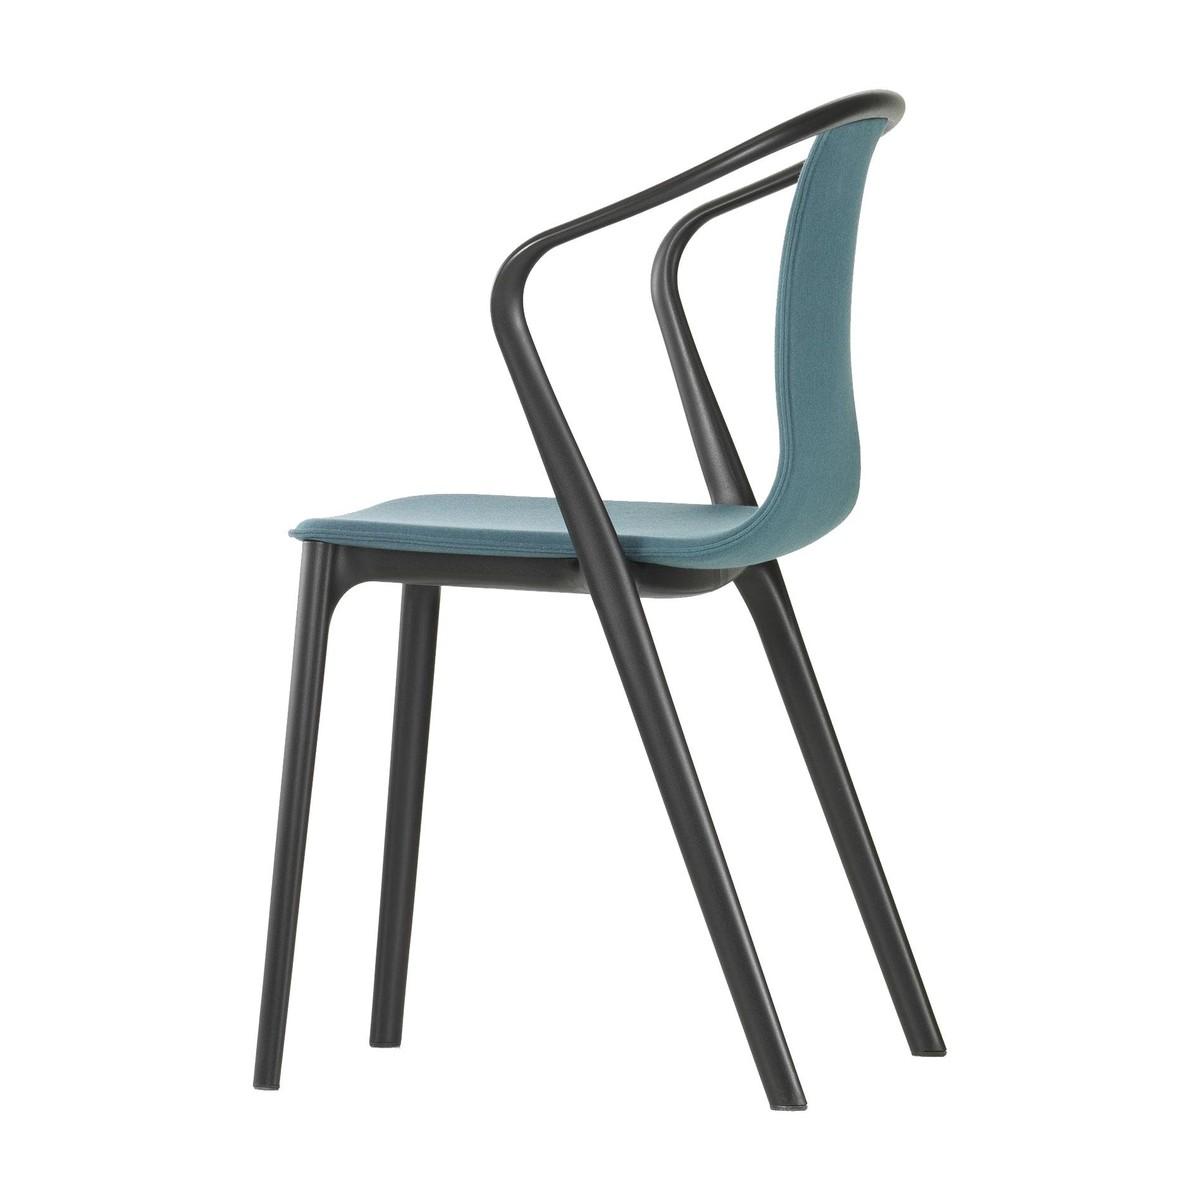 belleville armchair plastic chaise de jardin vitra. Black Bedroom Furniture Sets. Home Design Ideas